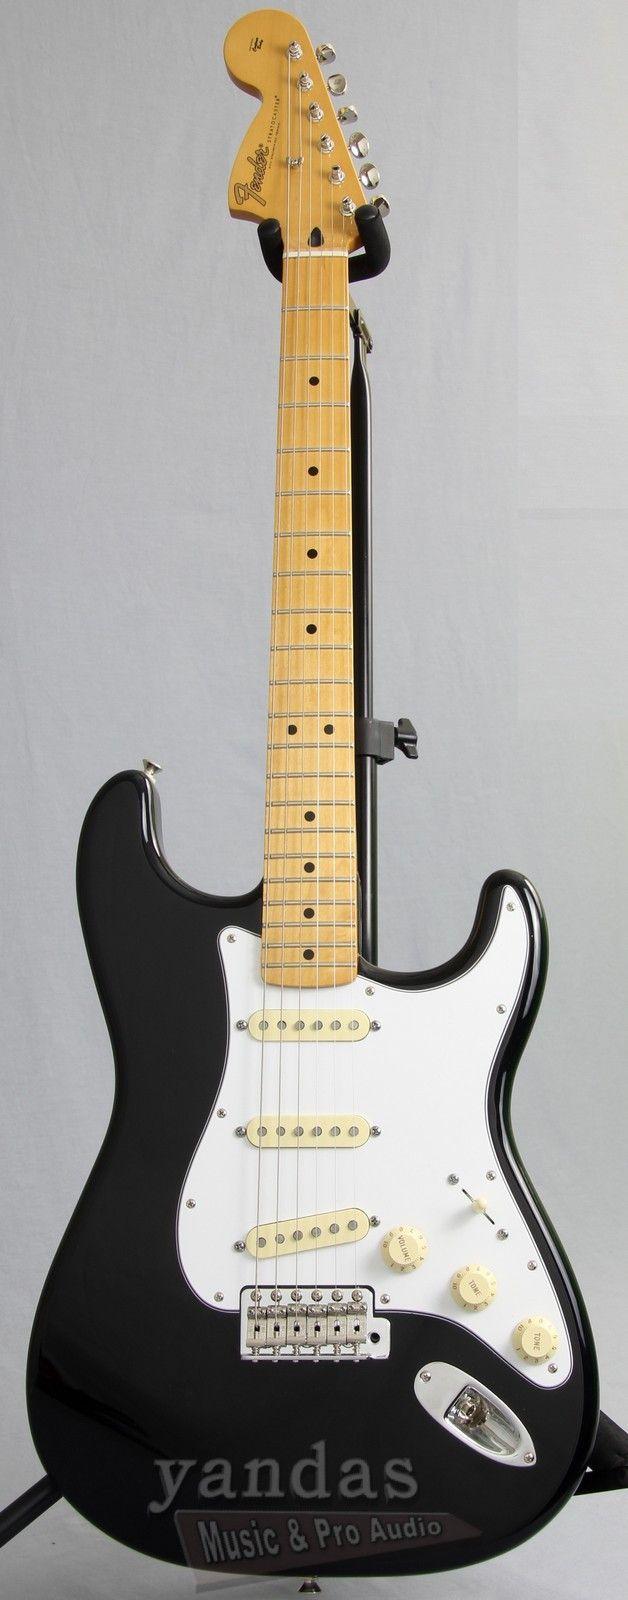 Fender Jimi Hendrix Stratocaster | Artist Series Electric Guitar